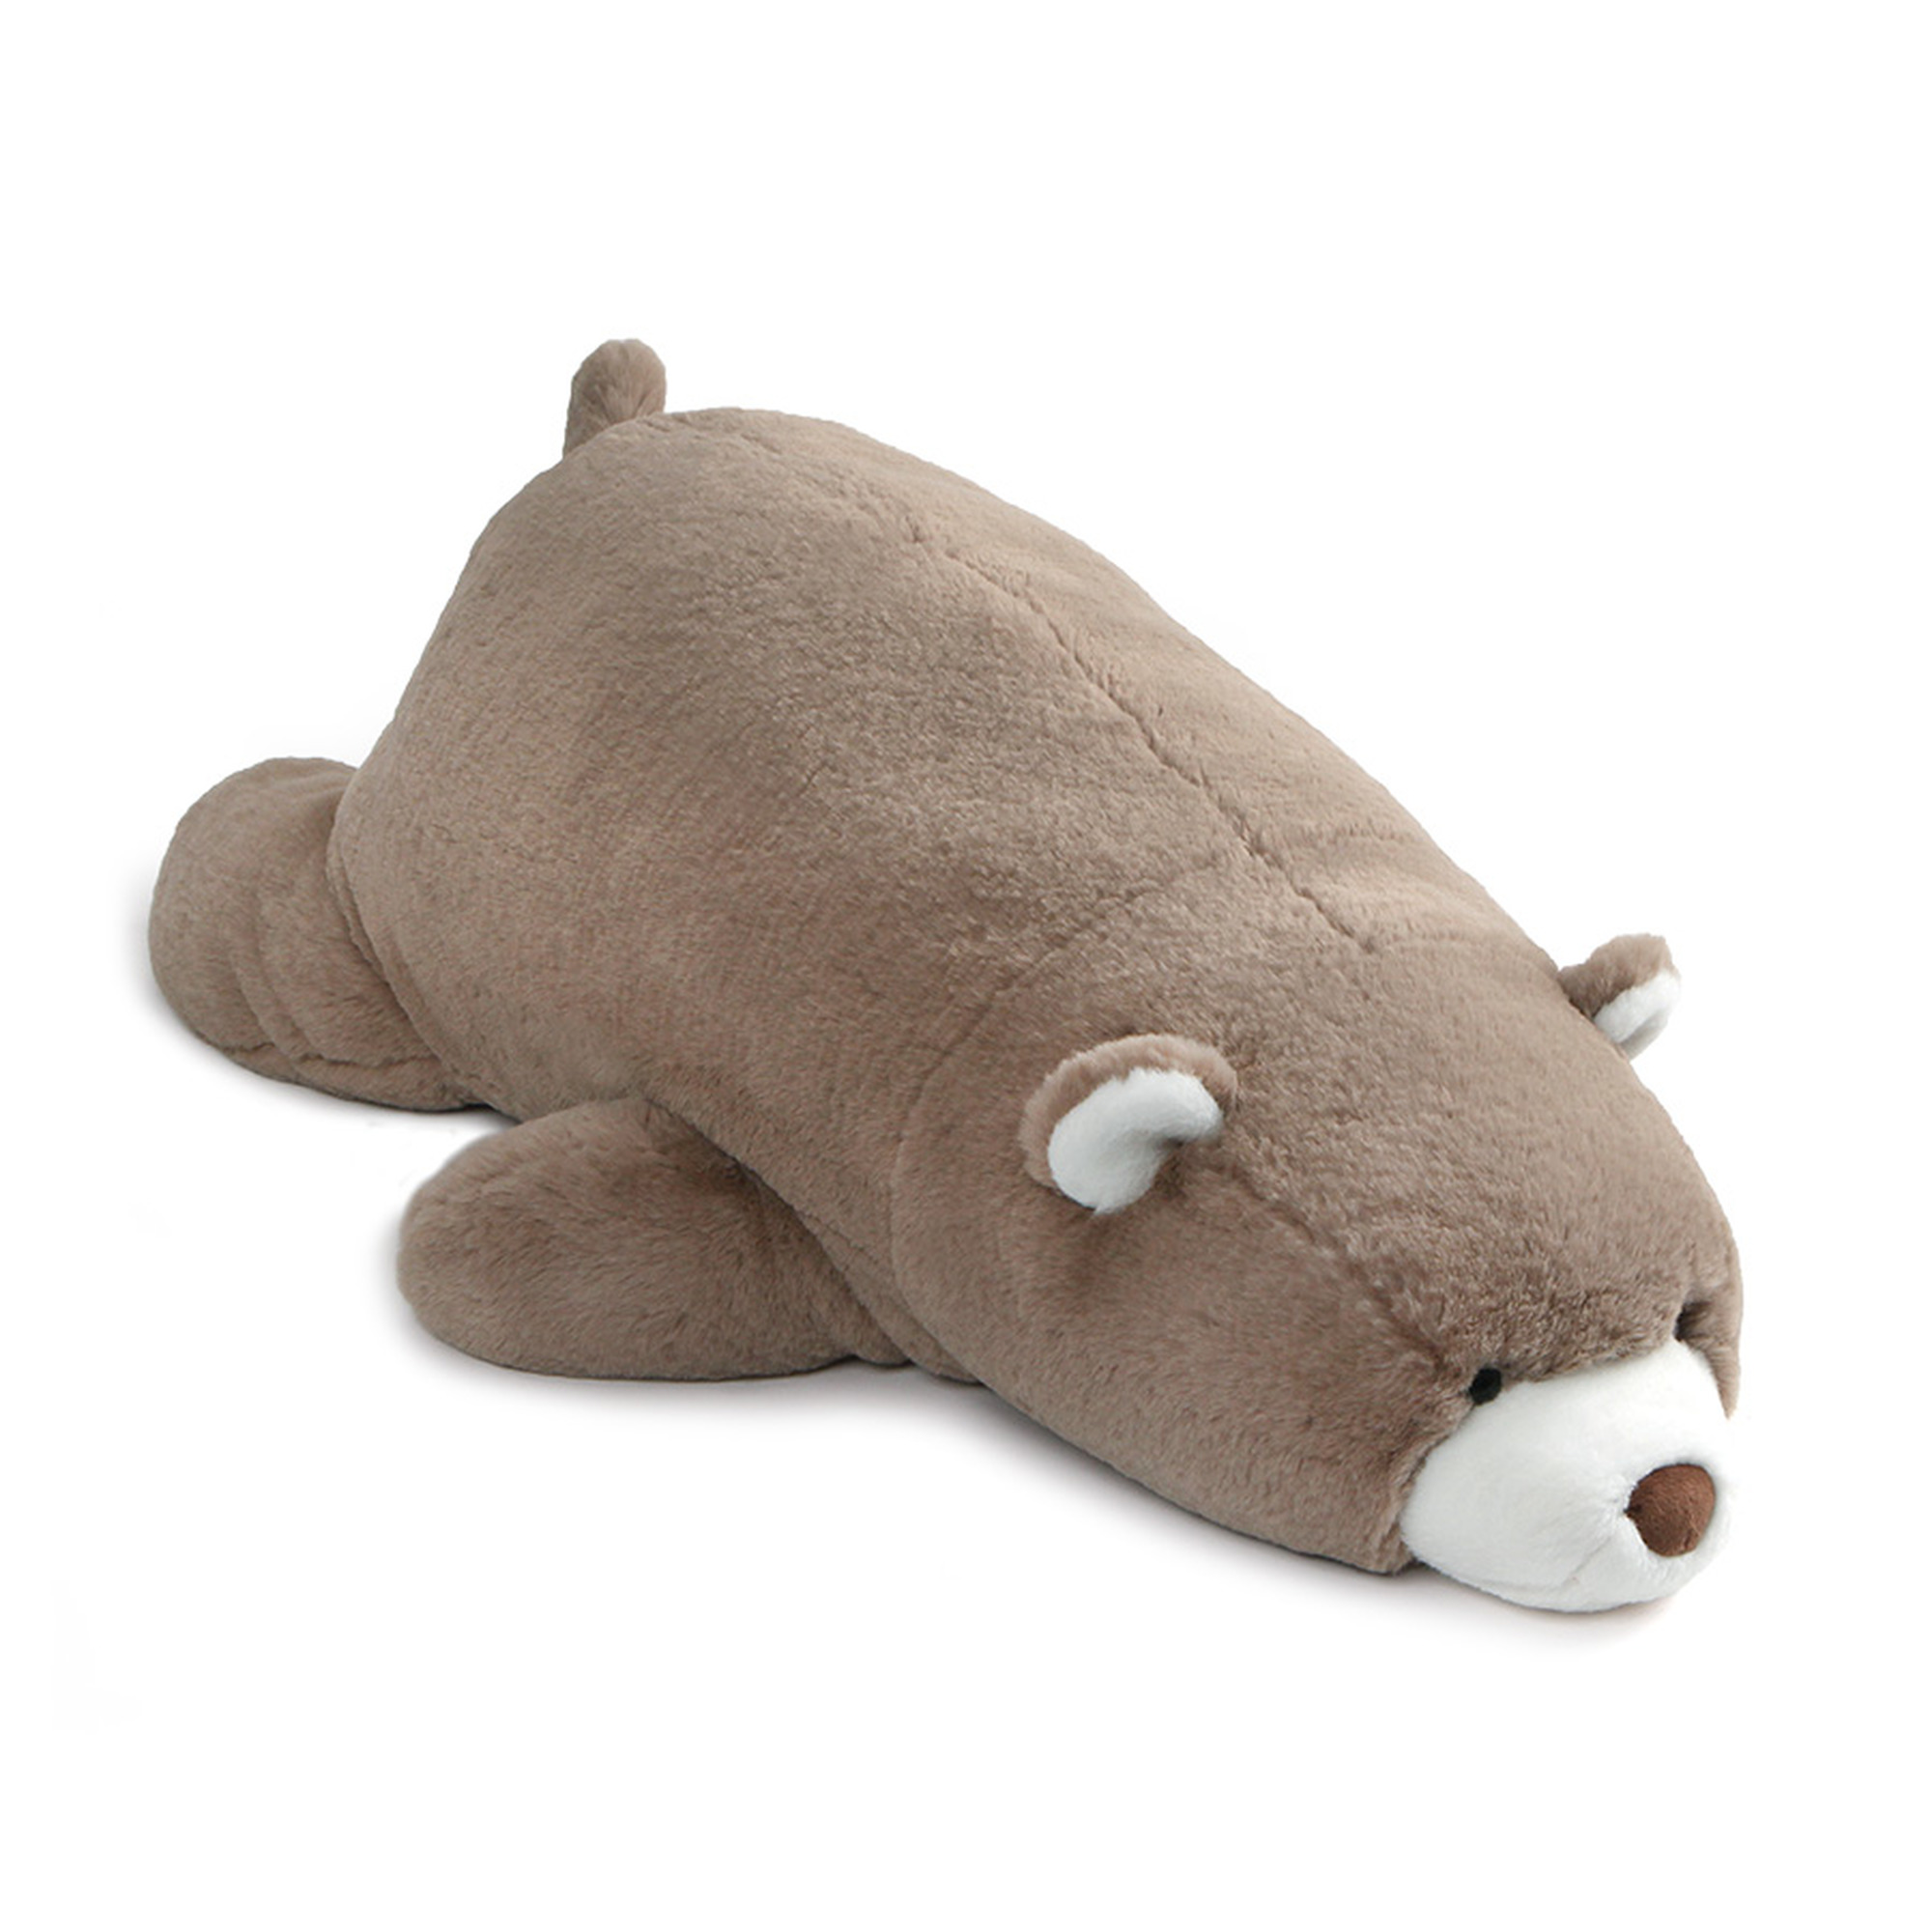 Gund Large Laying Down Snuffles Teddy Bear Plush Stuffed Animal 27� Toy, Taupe by GUND